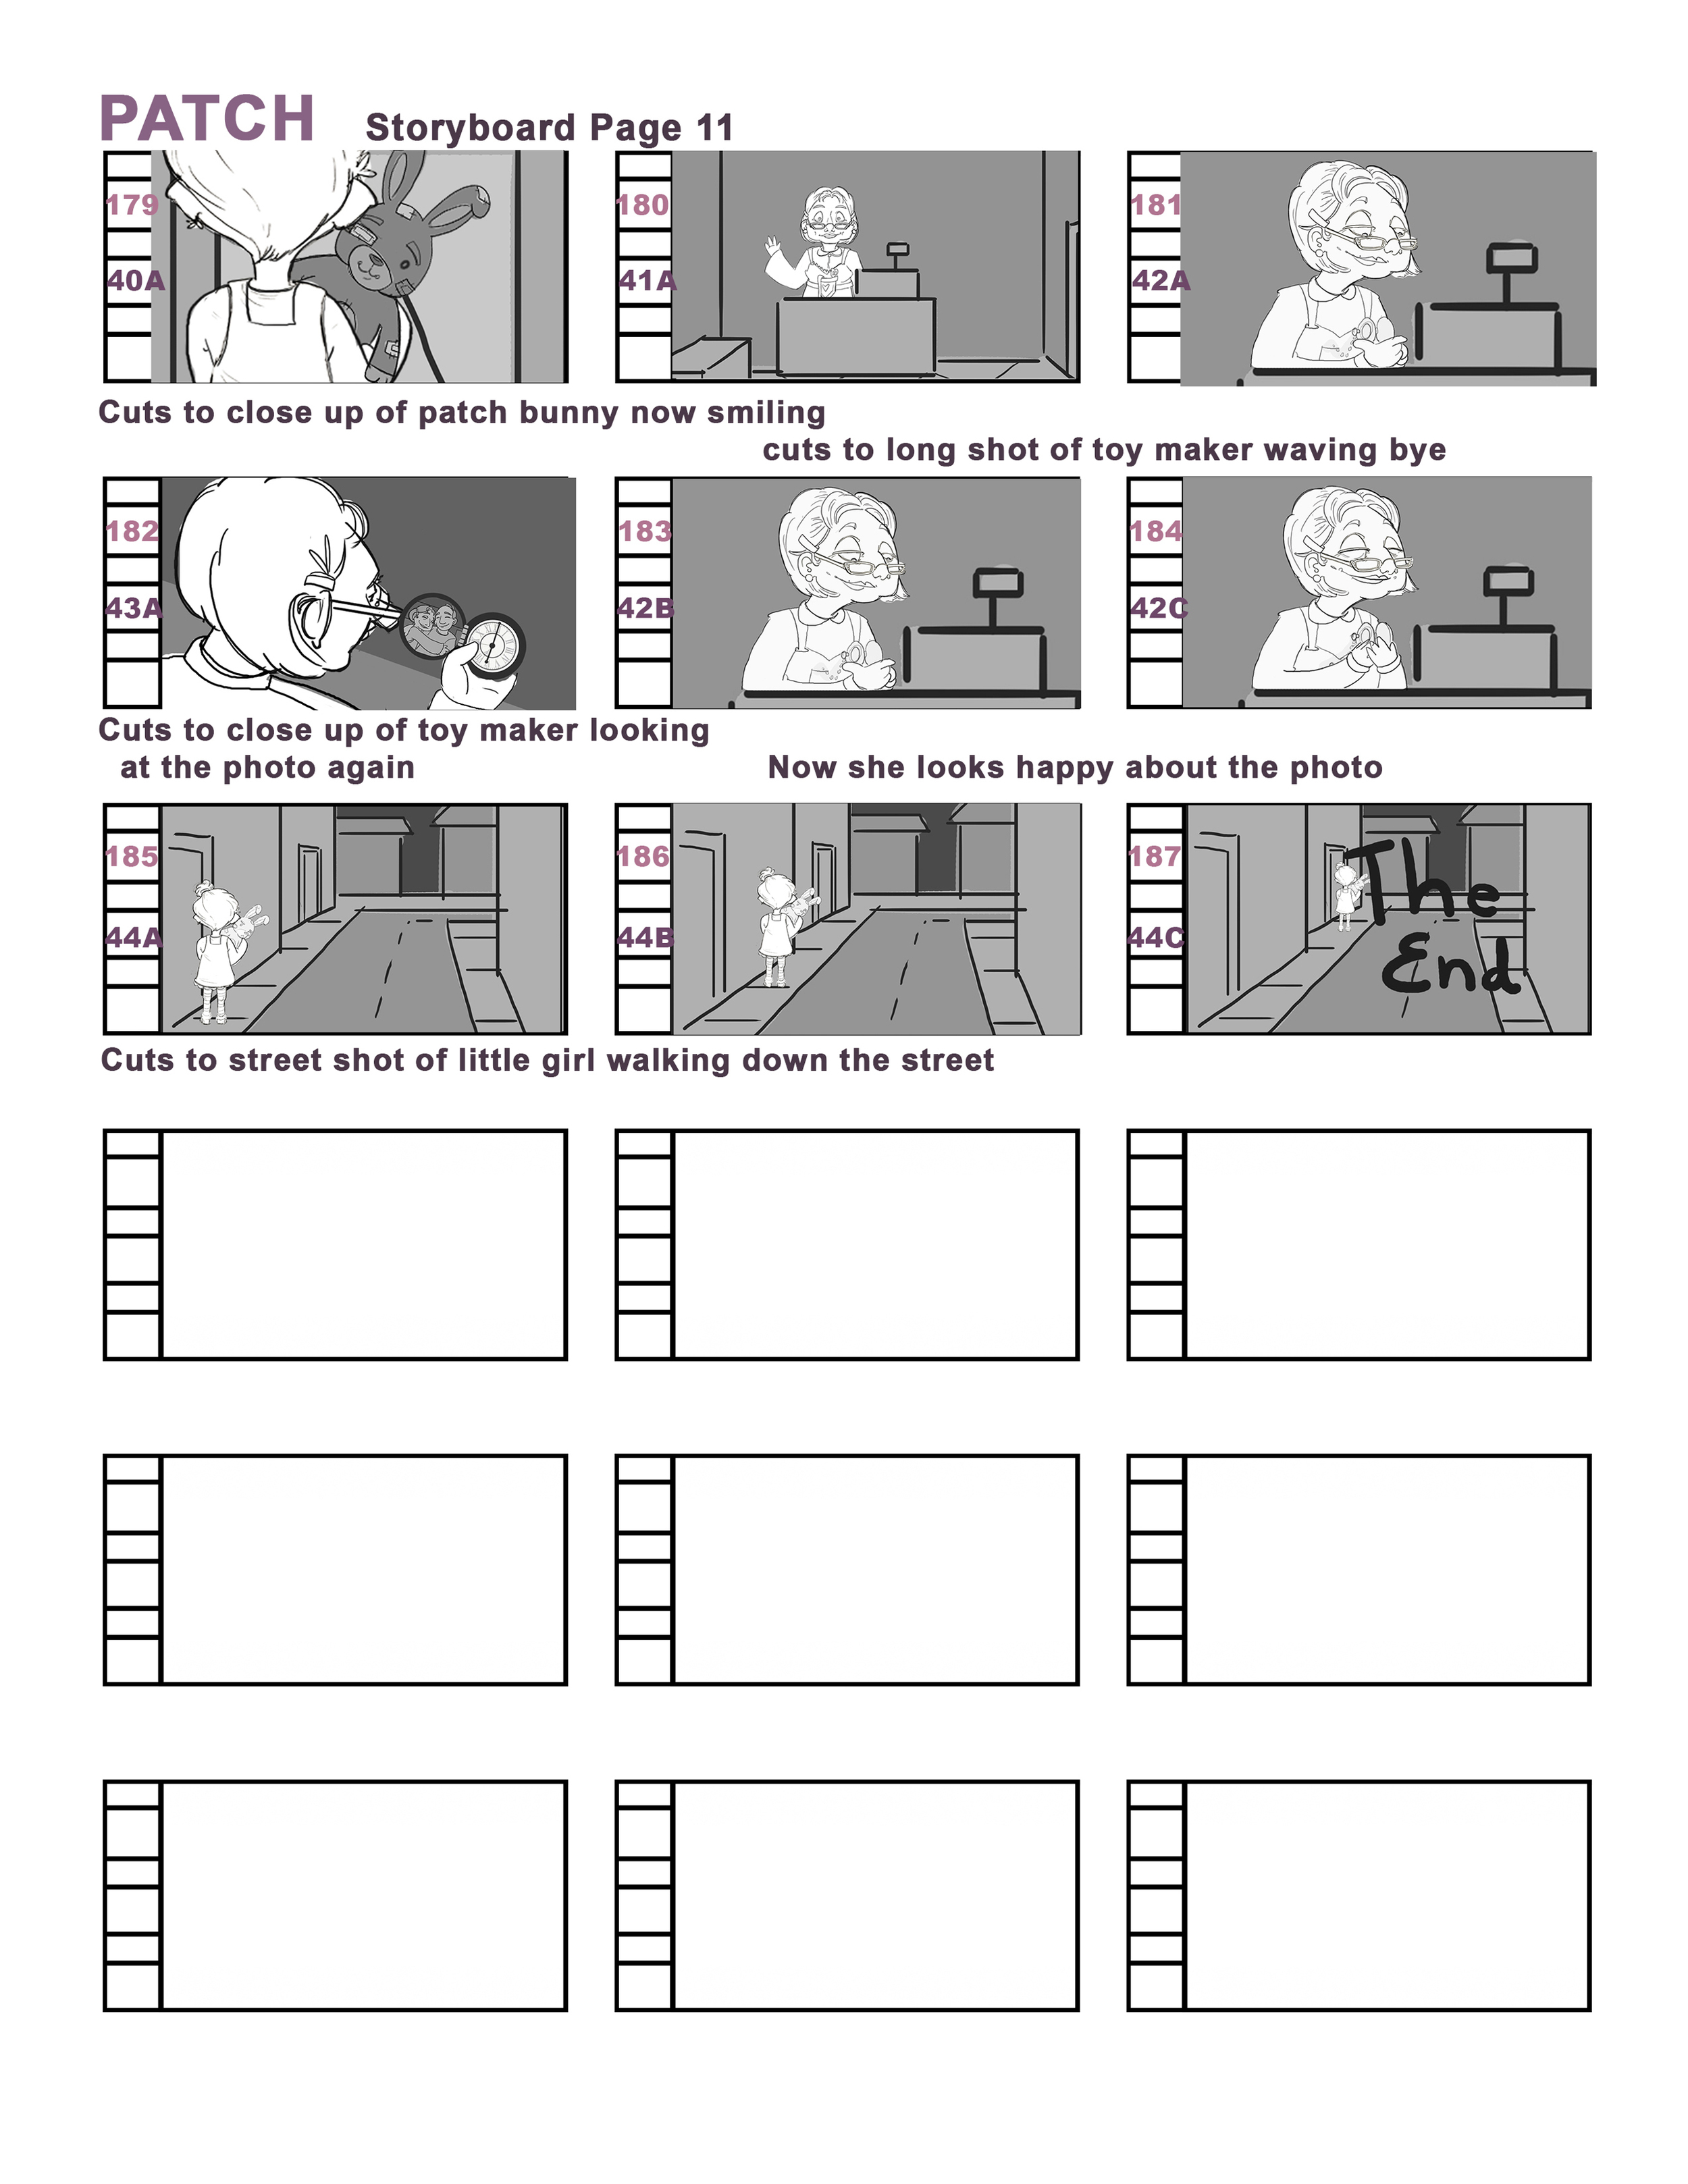 PATCH_storyboards_FINAL_011.jpg